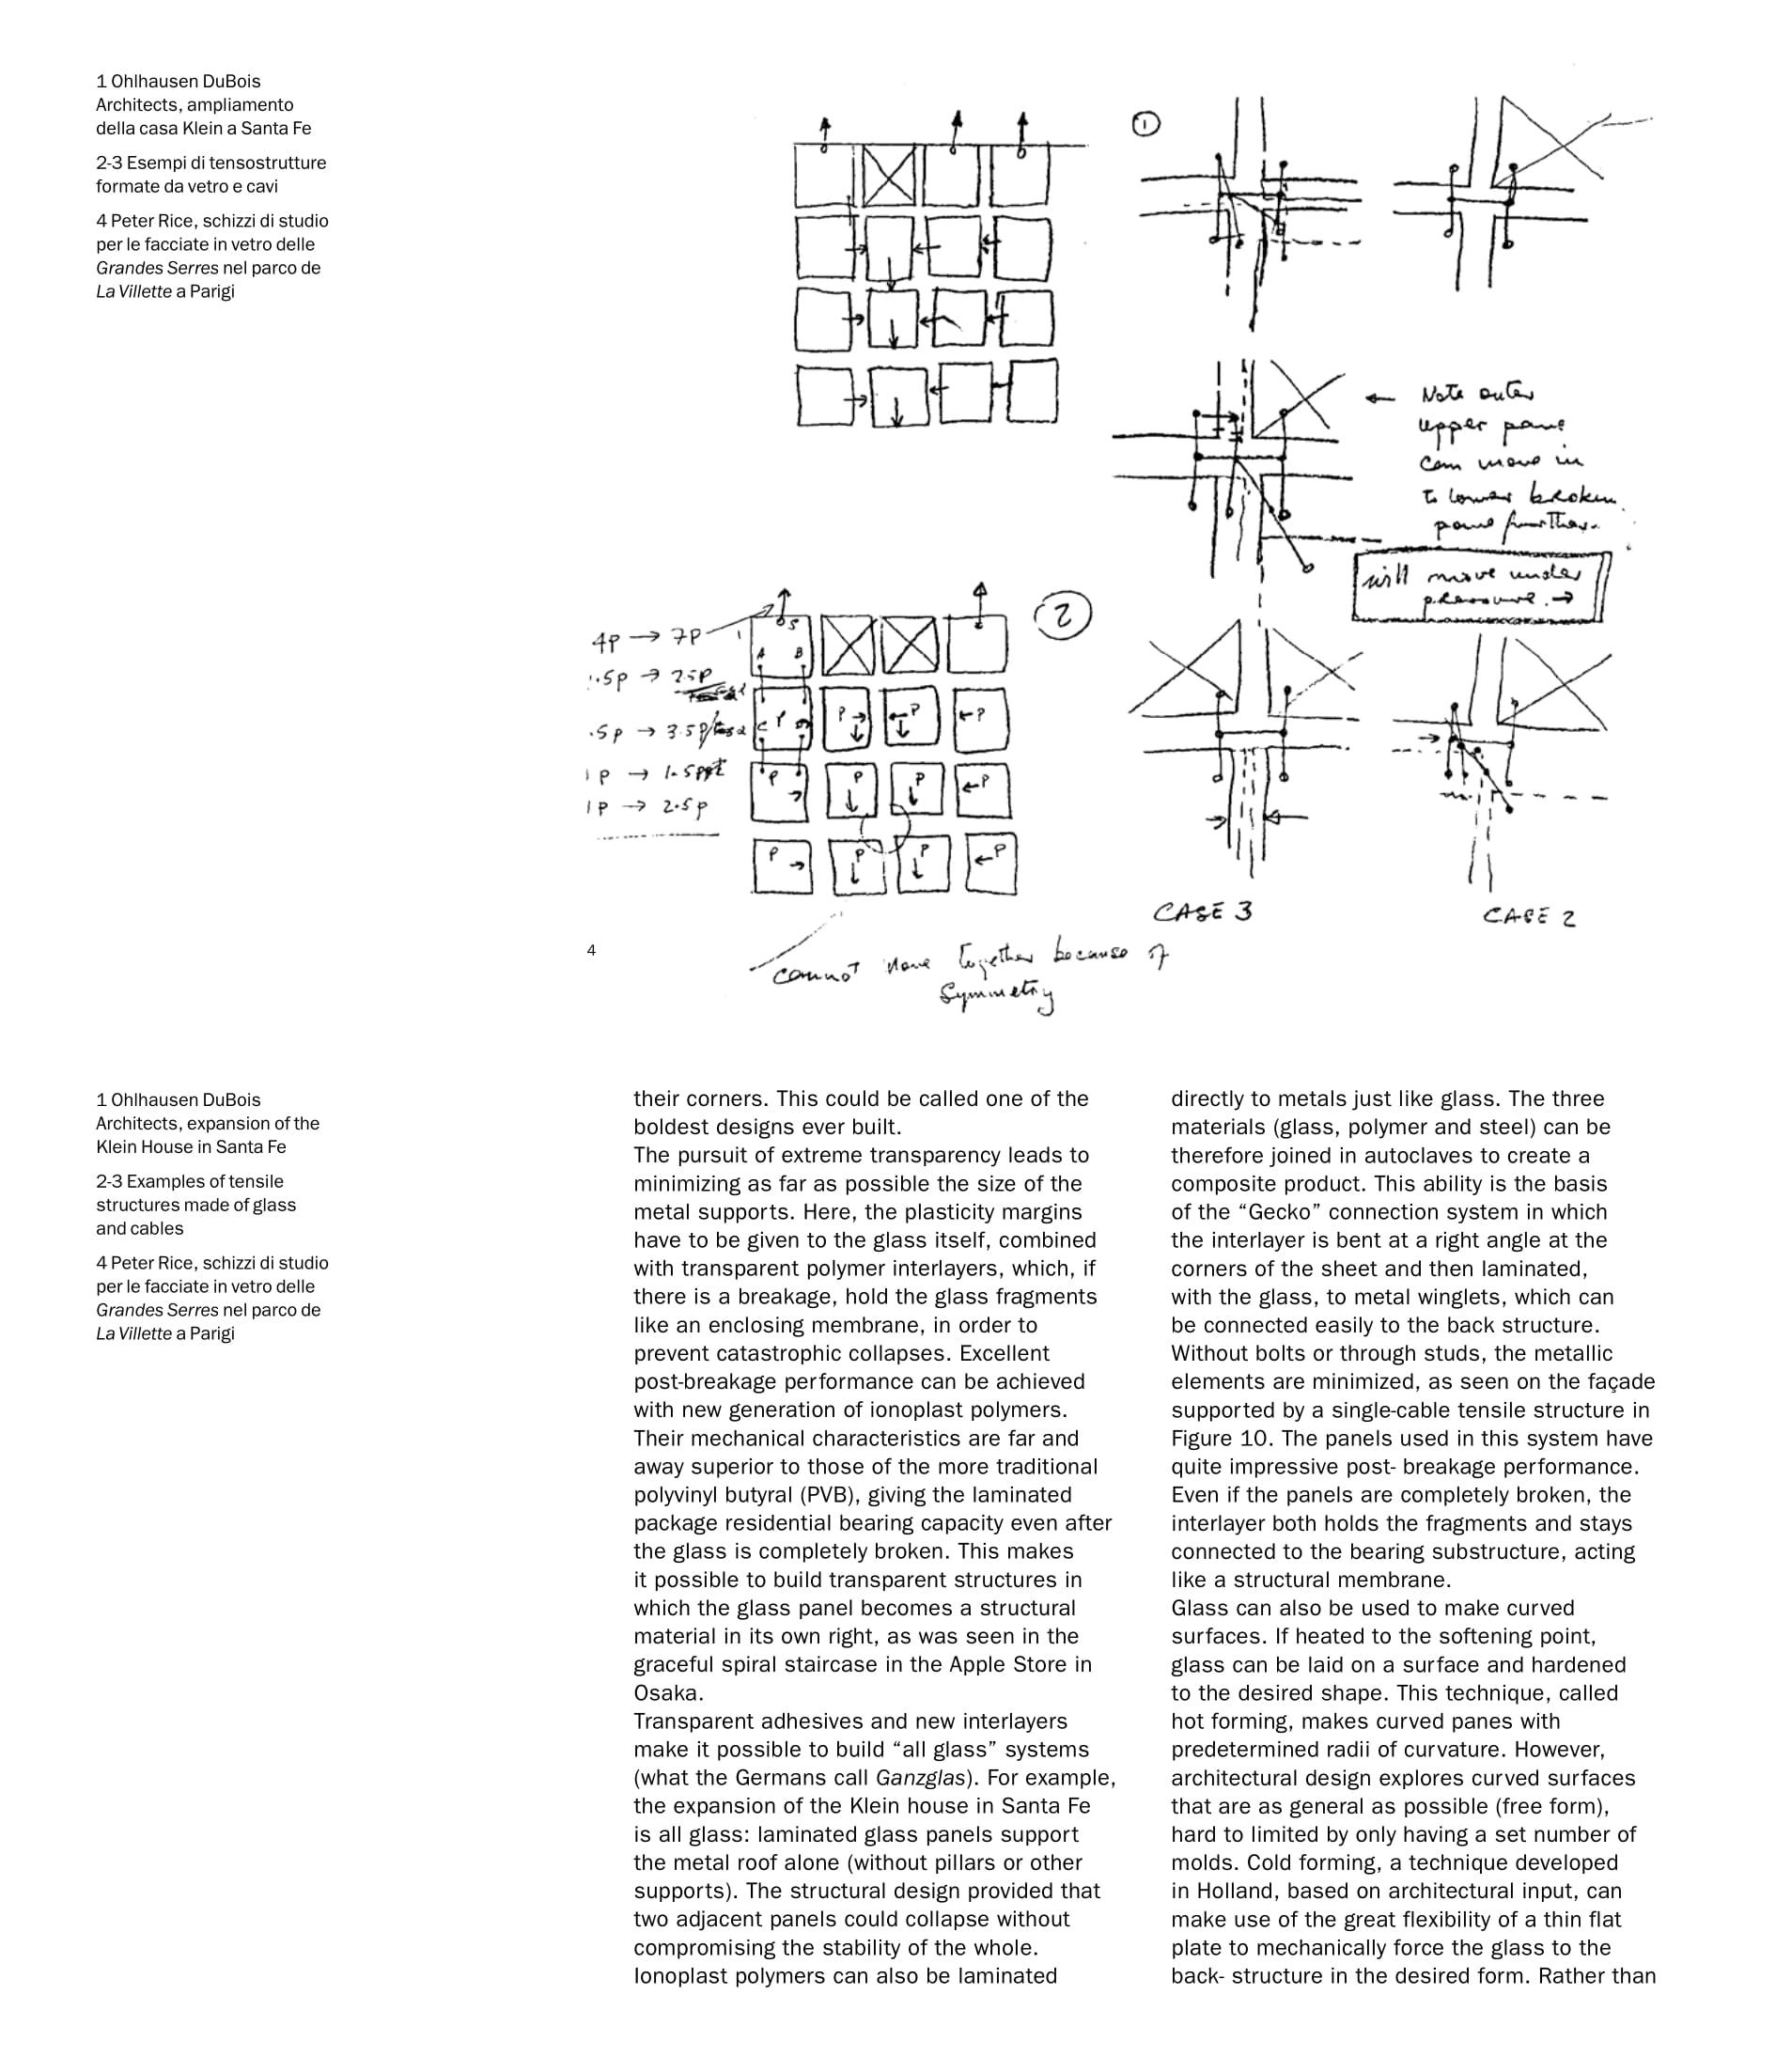 DuBois+Santa+Fe+Materia-4.jpg